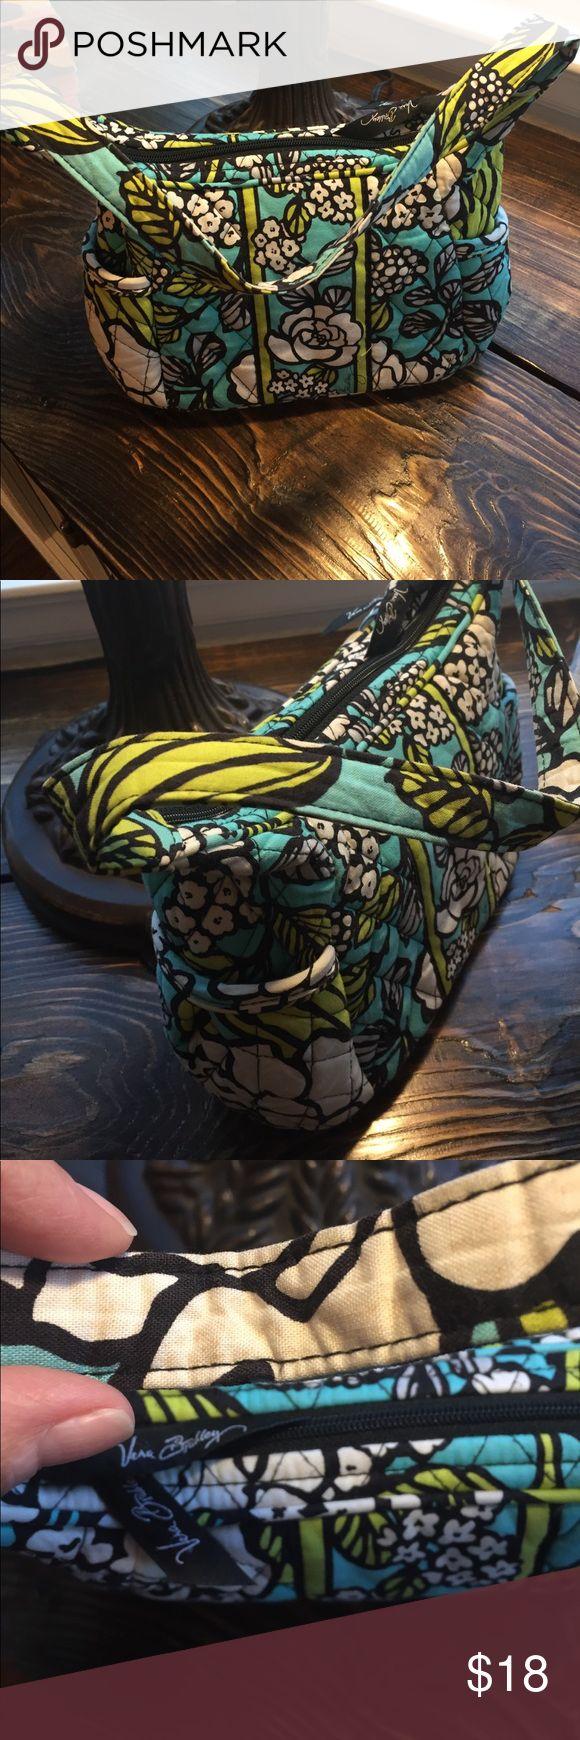 ✨sale- Vera Bradley small bag 10x6x3. Some spots on the handle and inside Vera Bradley Bags Mini Bags